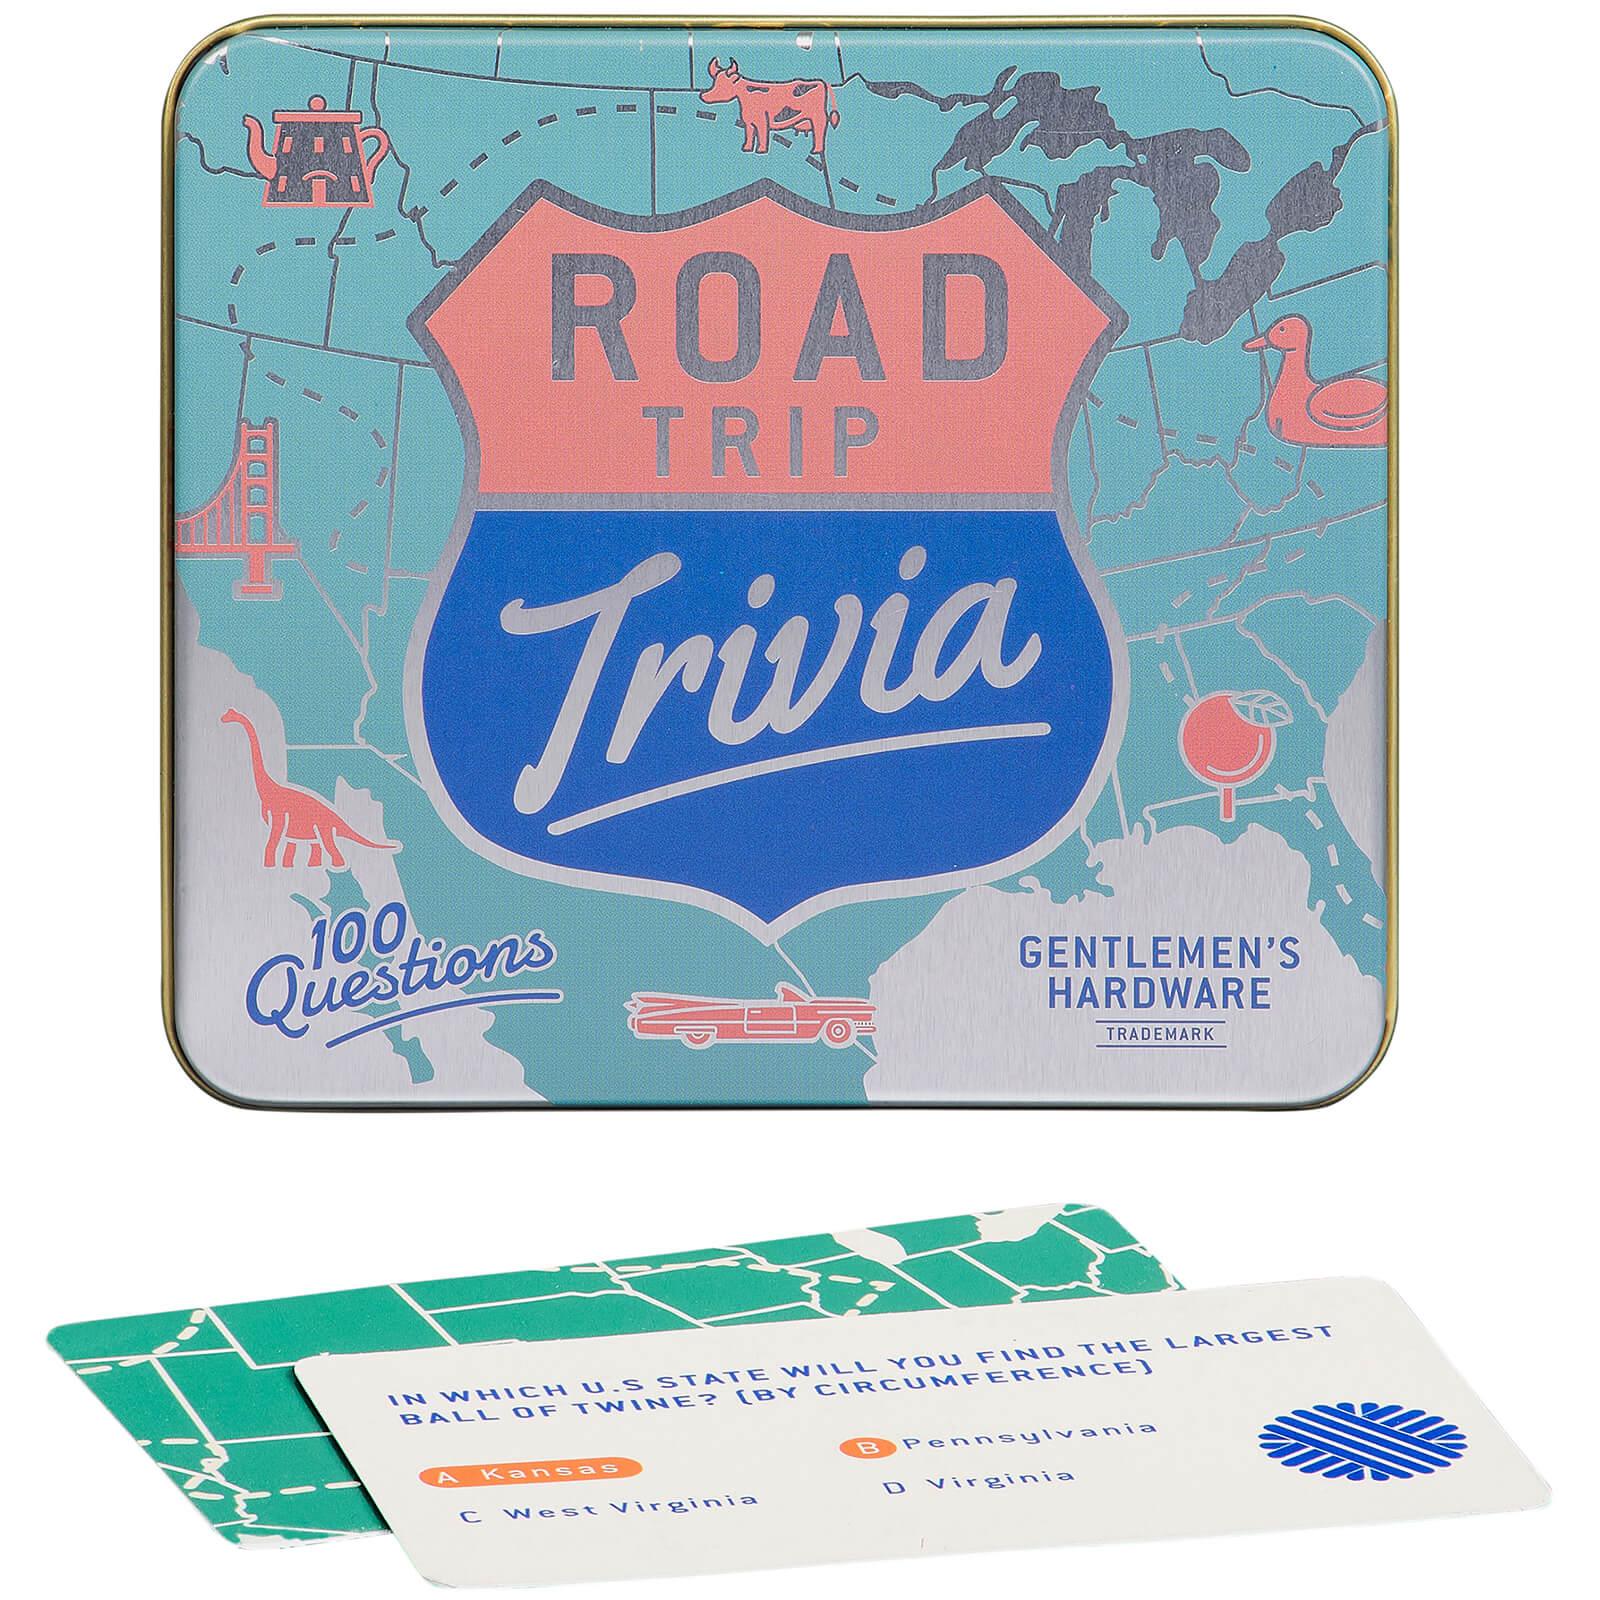 Image of Gentlemen's Hardware Road Trip Trivia Cards